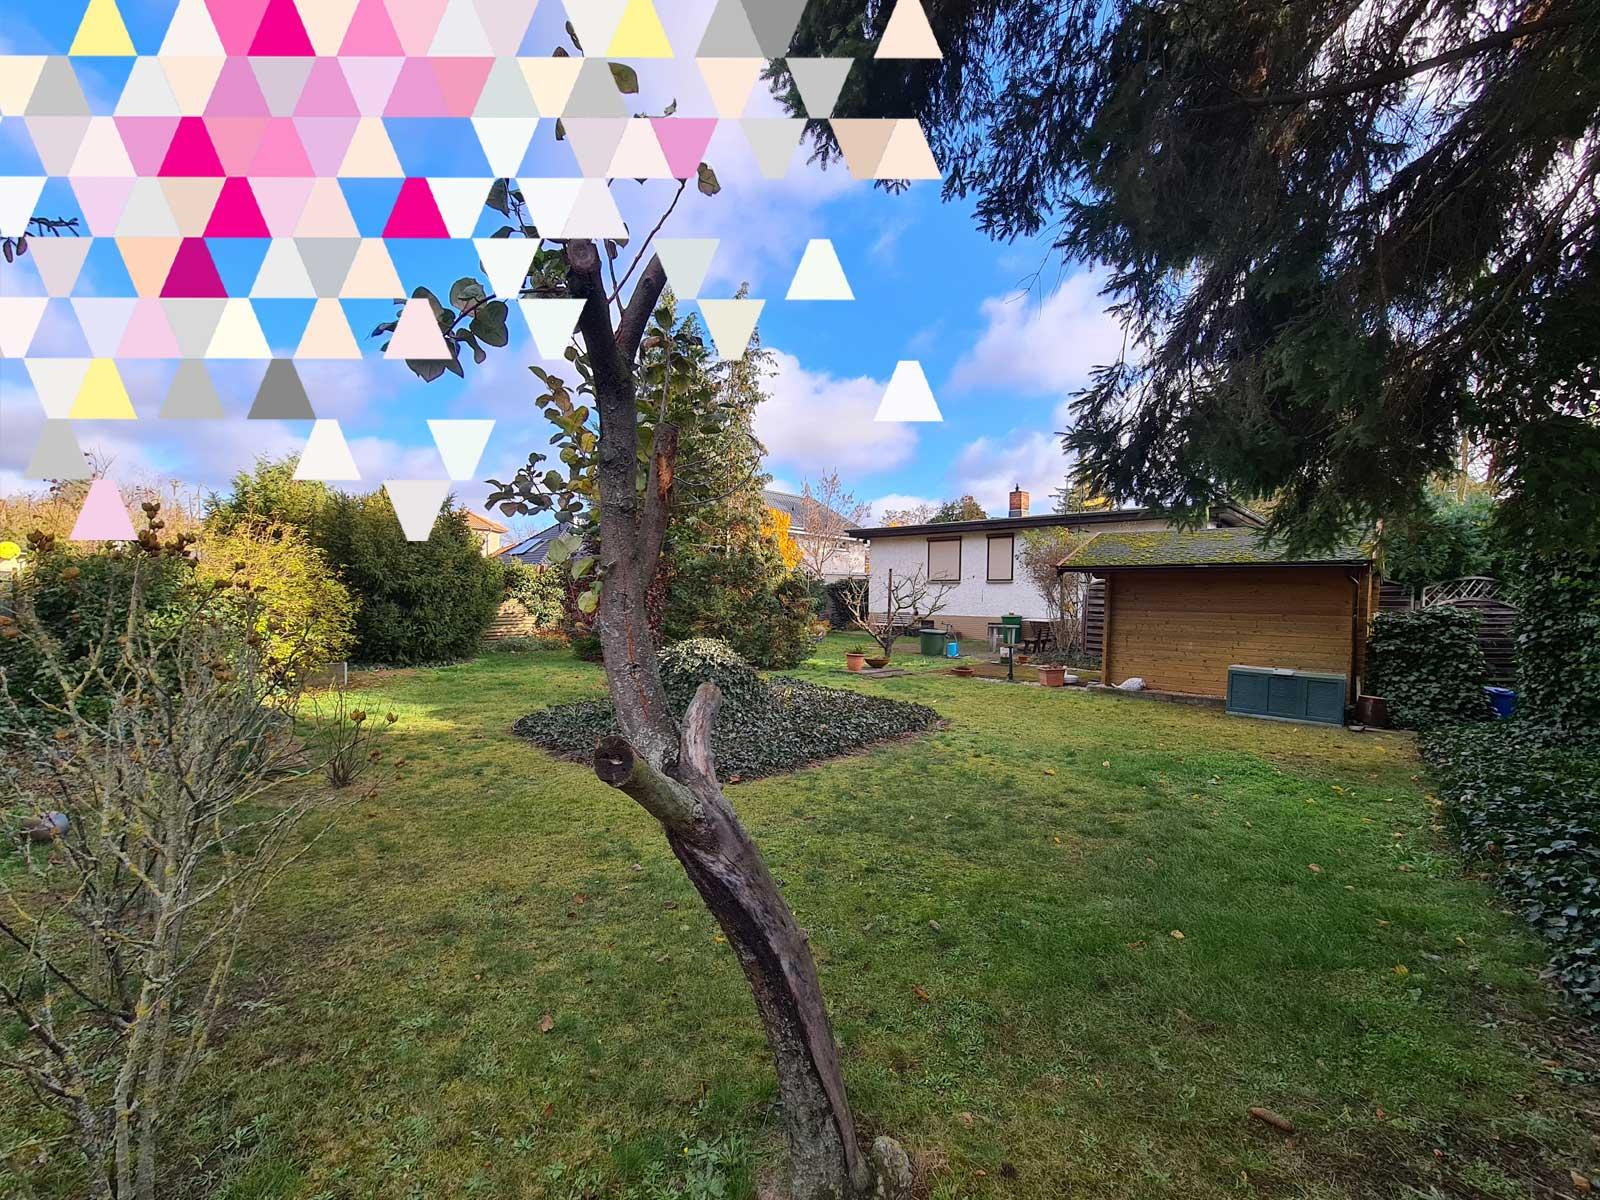 Grundstück | Verkauft mit Bauträgerbindung | ca. 451 m² | Berlin-Kaulsdorf